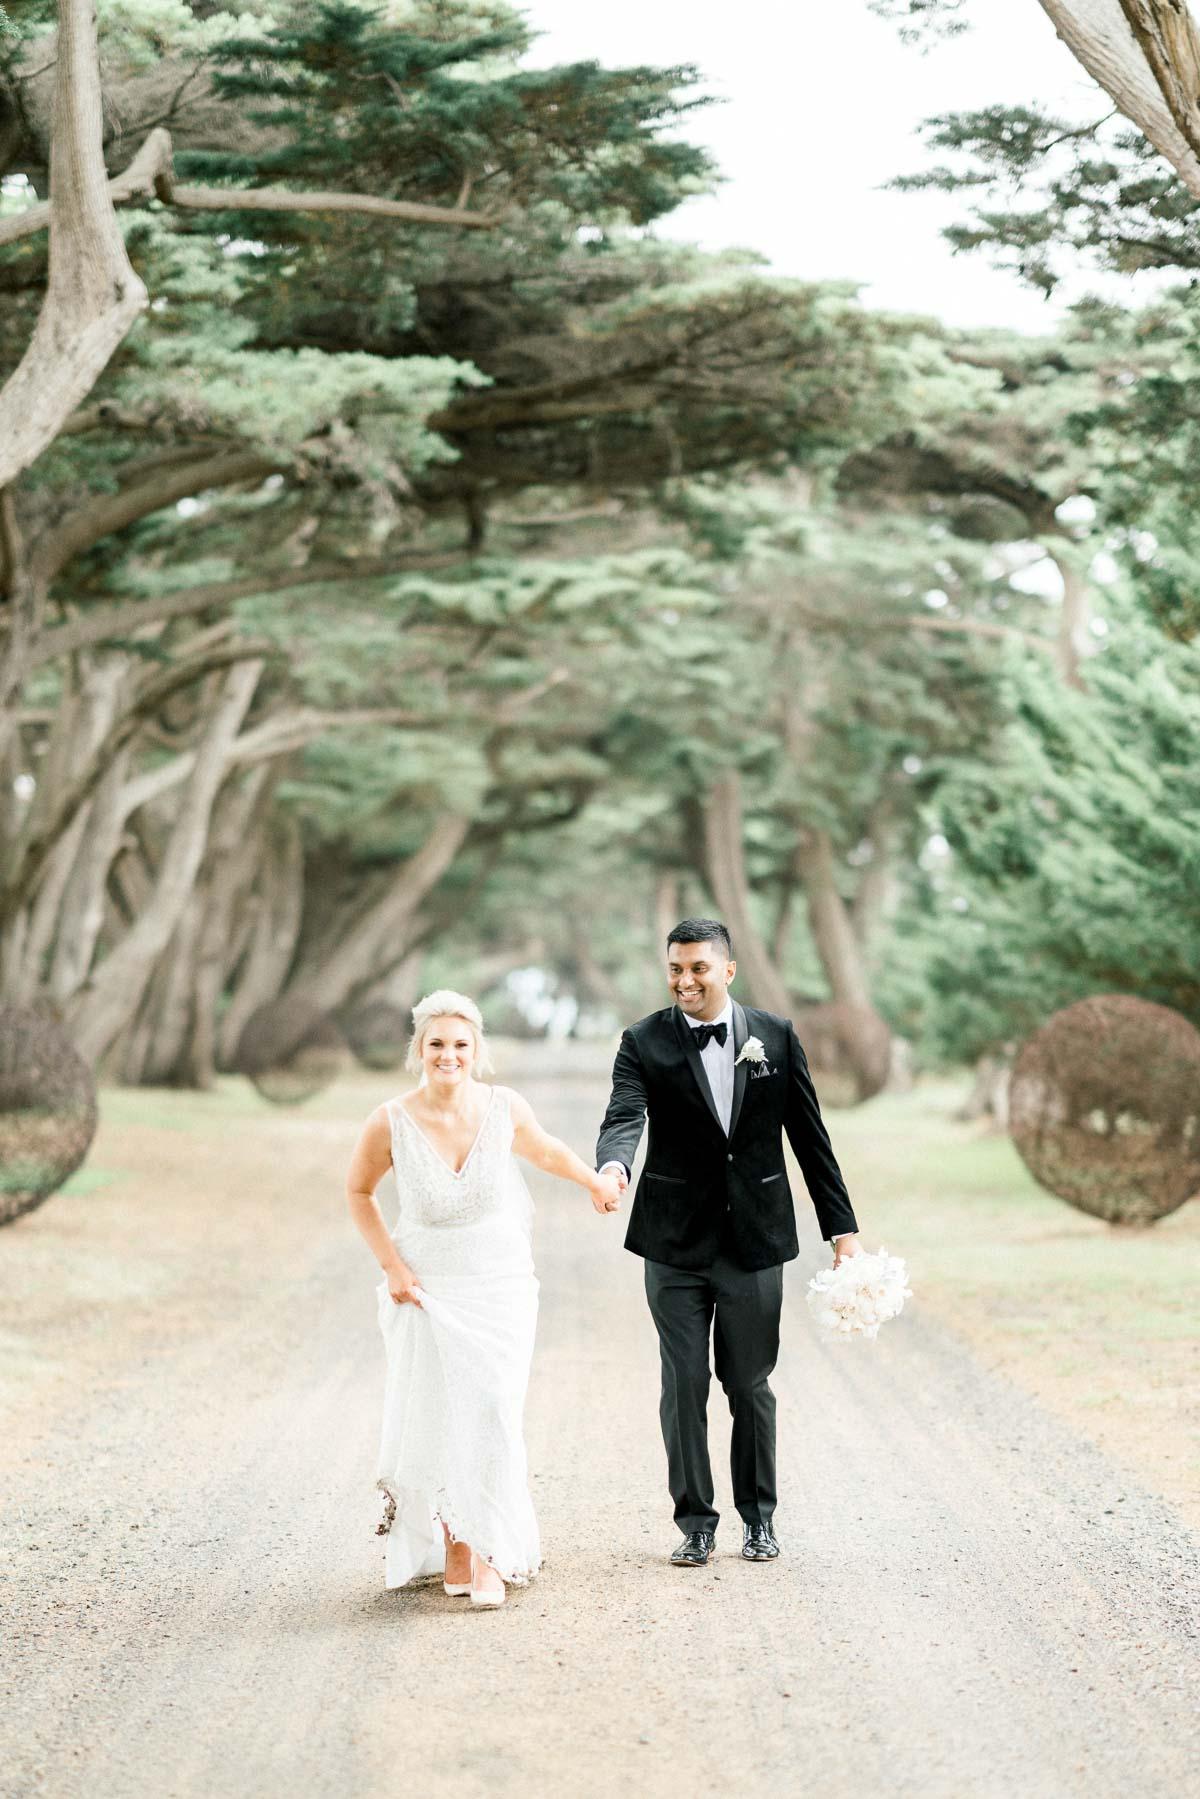 trenavin-chapel-phillip-island-wedding-heart+soul-weddings-sally-sean-01526.jpg